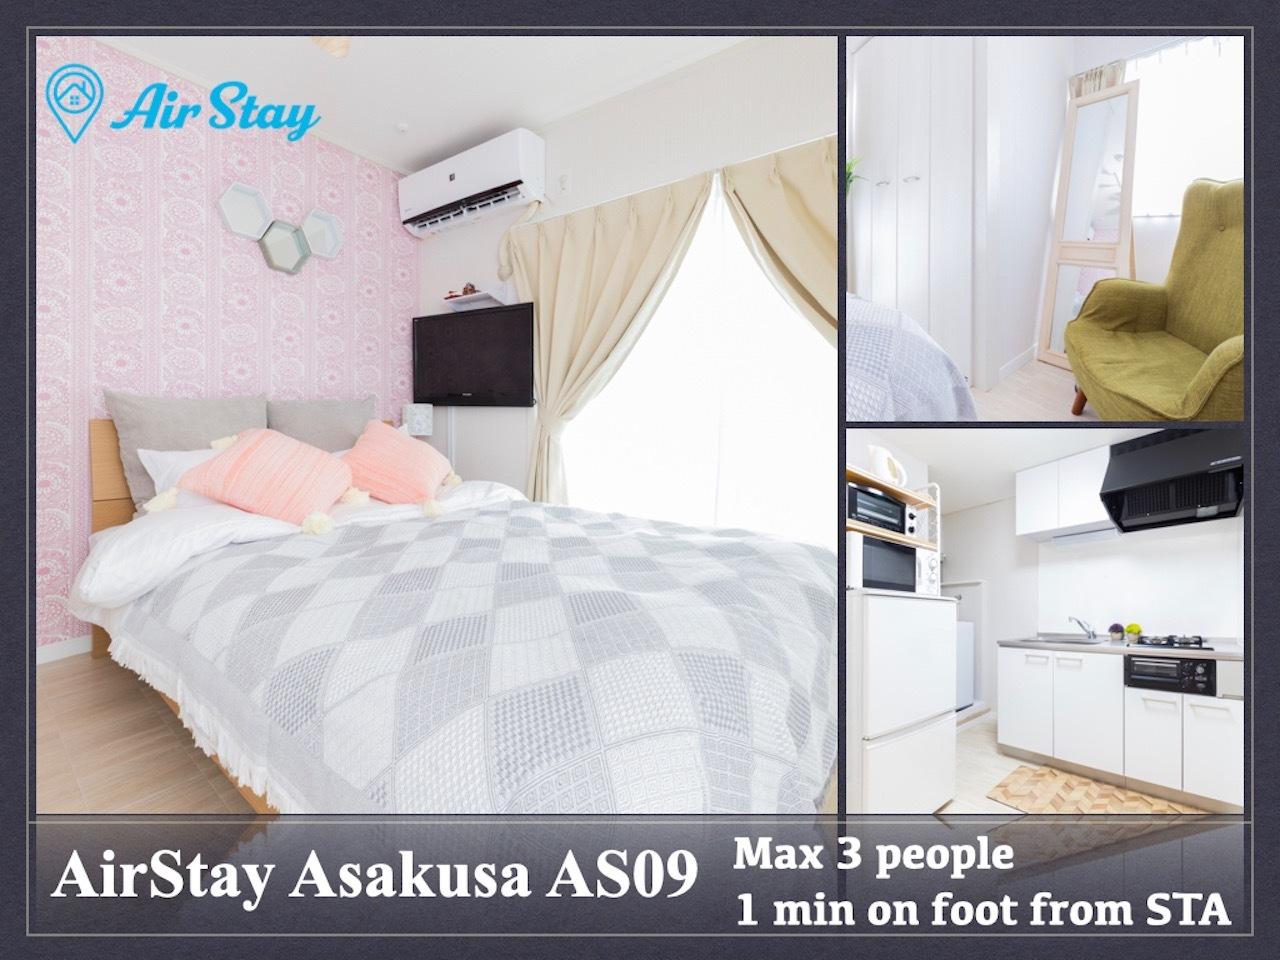 AirStay浅草AS09 /帰国滞在歓迎/早割長期割/空港ピックアップ/高速WiFi